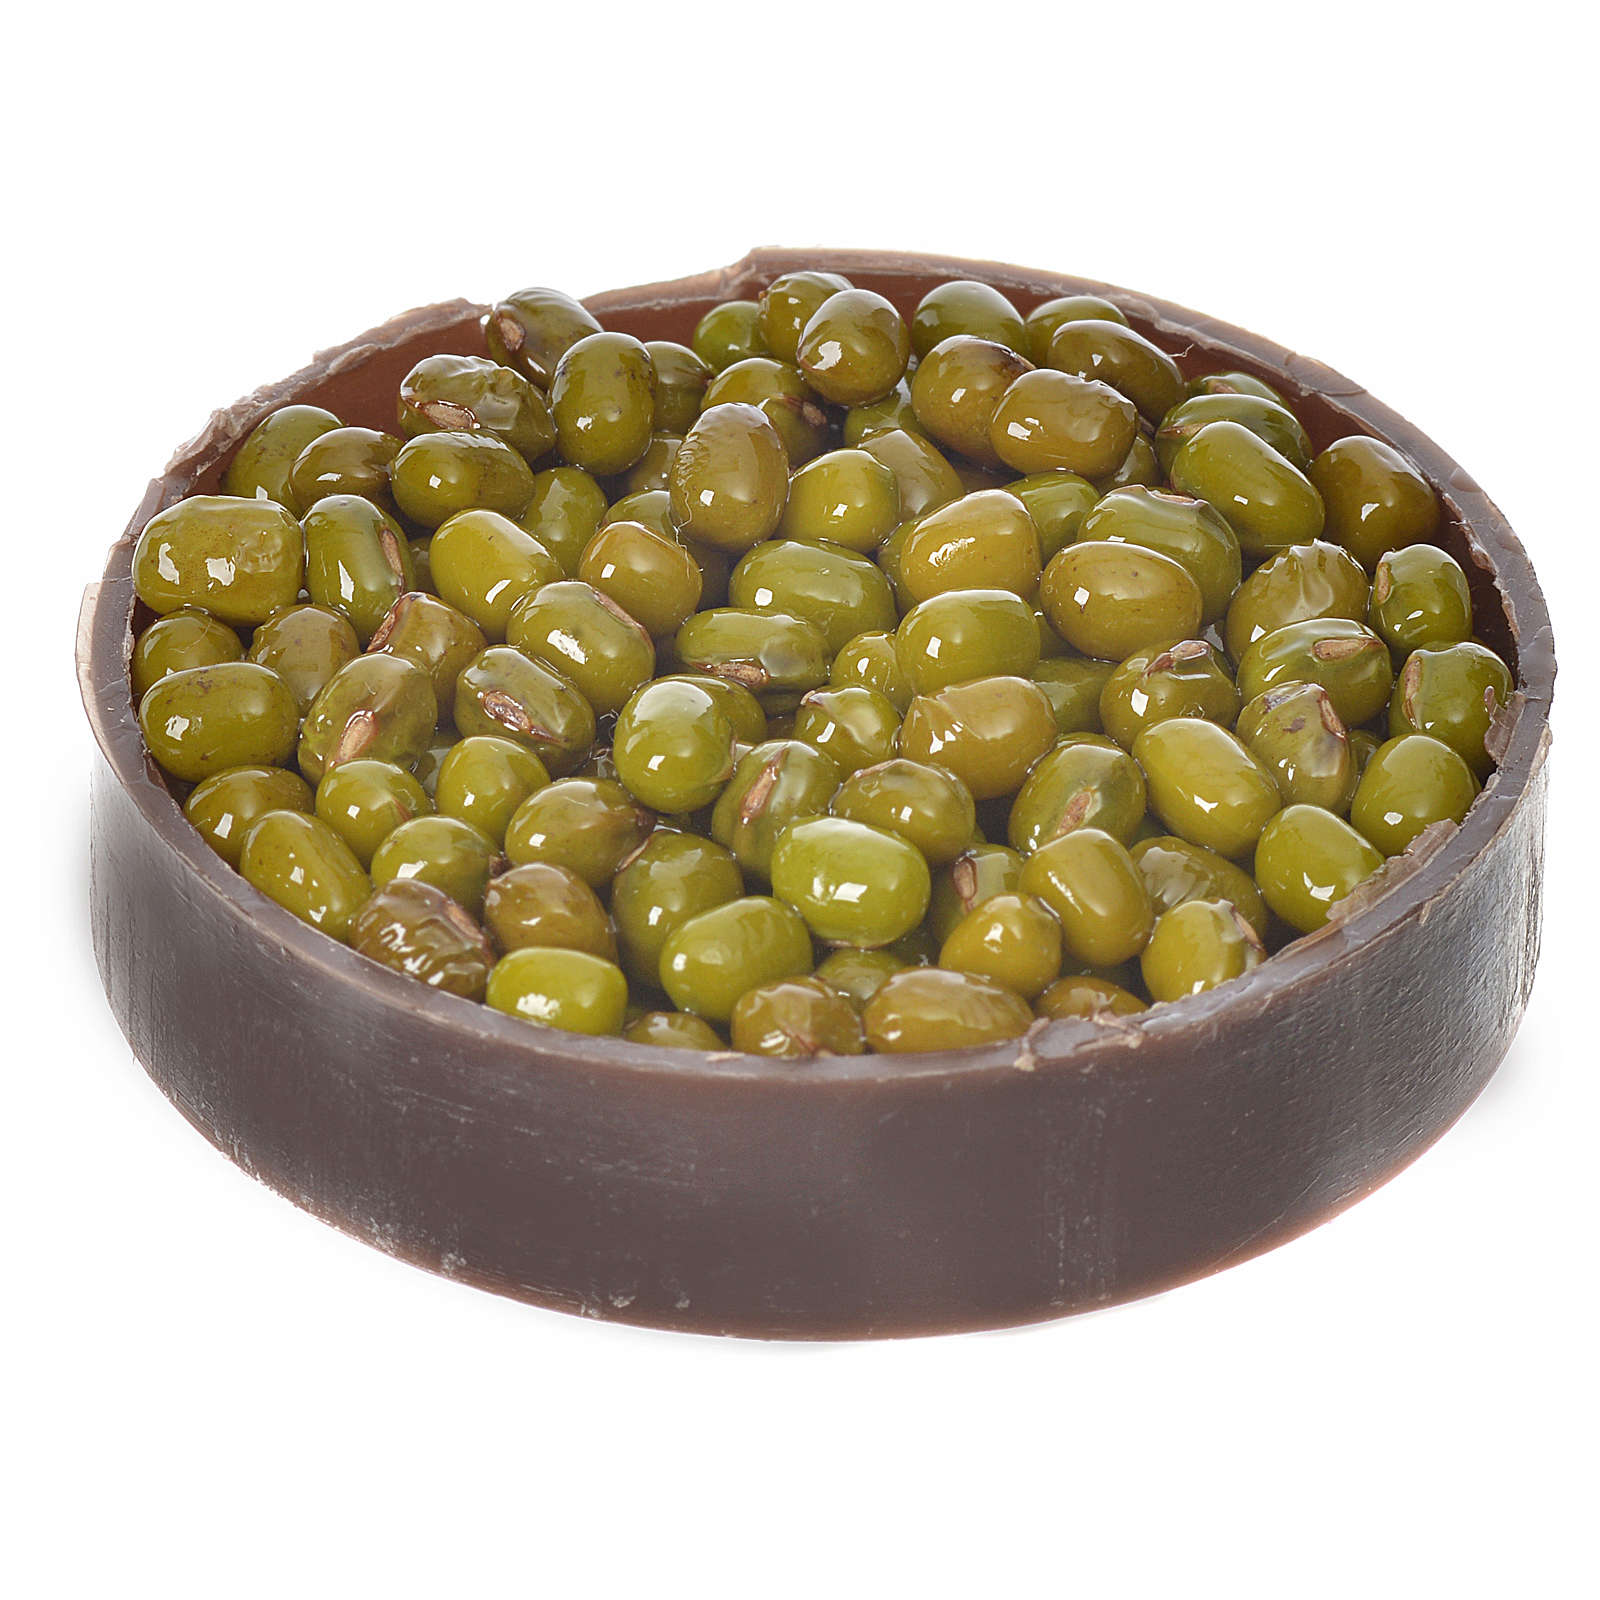 Cassetta in plastica con olive per presepe diam 5 cm 4